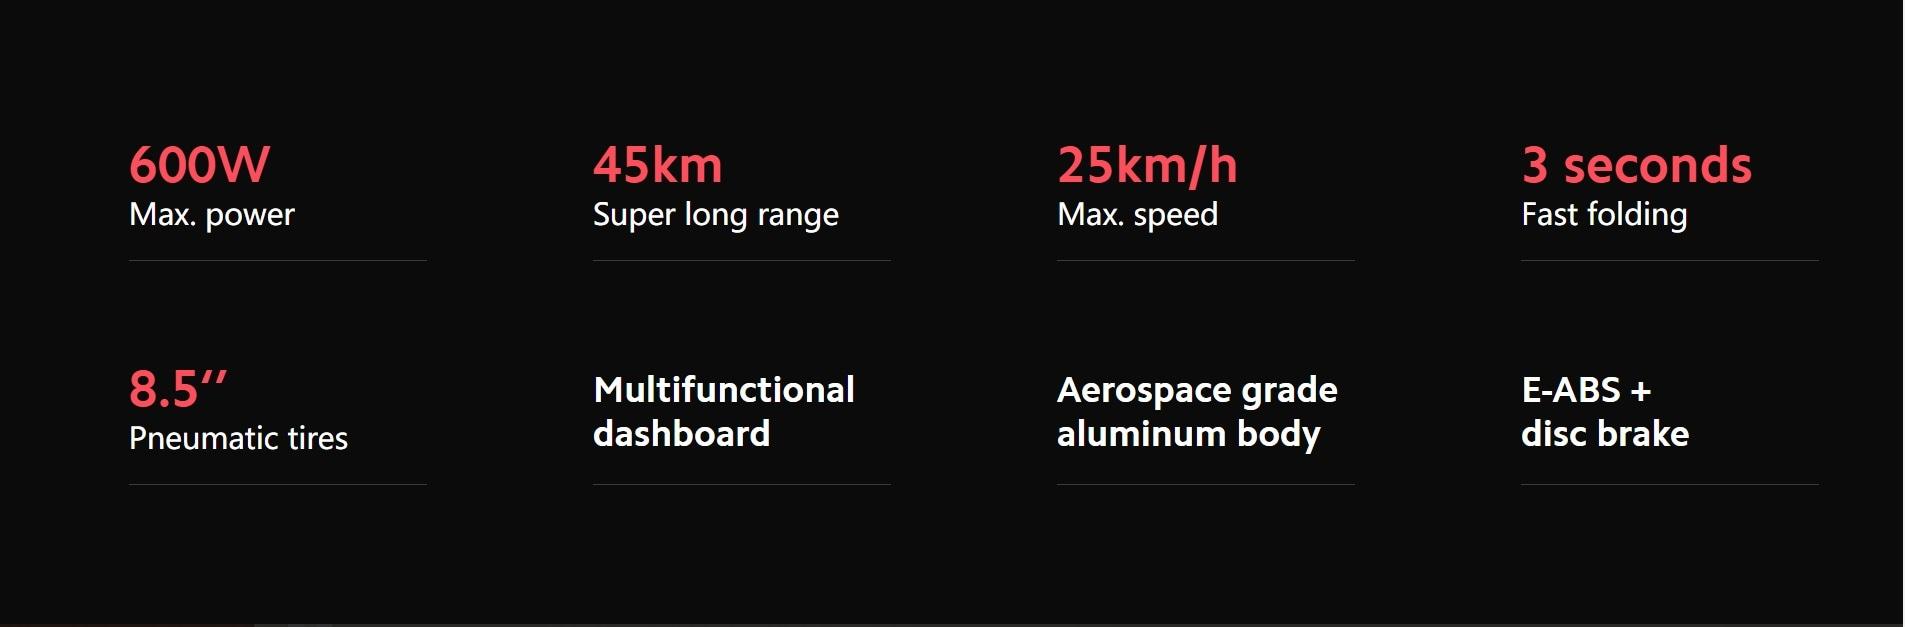 Xiaomi Mi M365 Pro 2 Kickscooter Global Wholesale